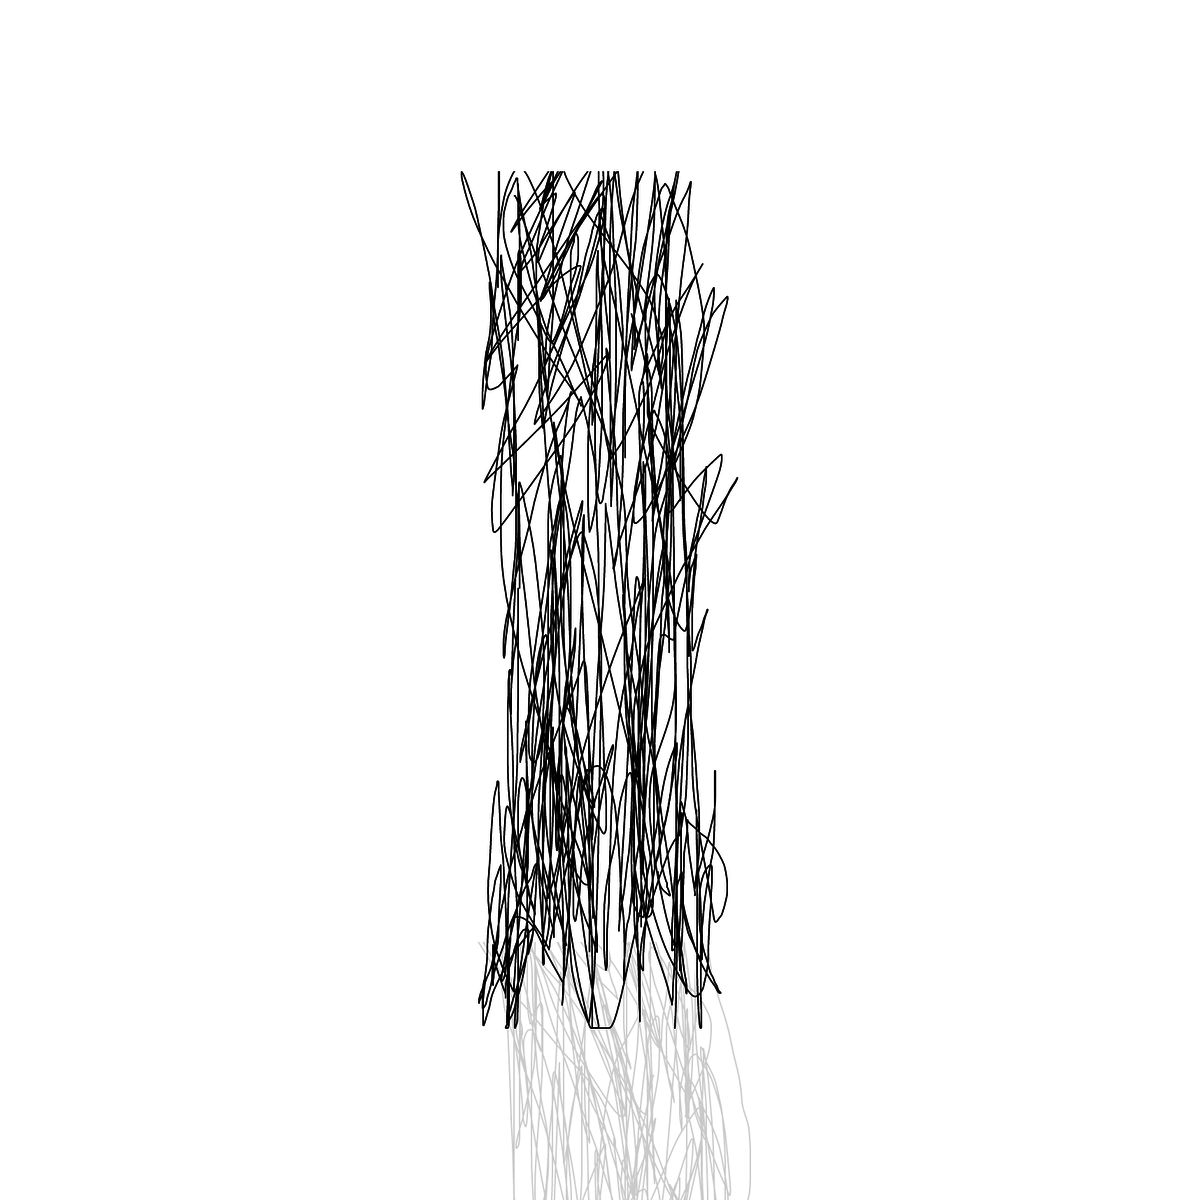 BAAAM drawing#6141 lat:51.3322944641113300lng: 12.3623371124267580